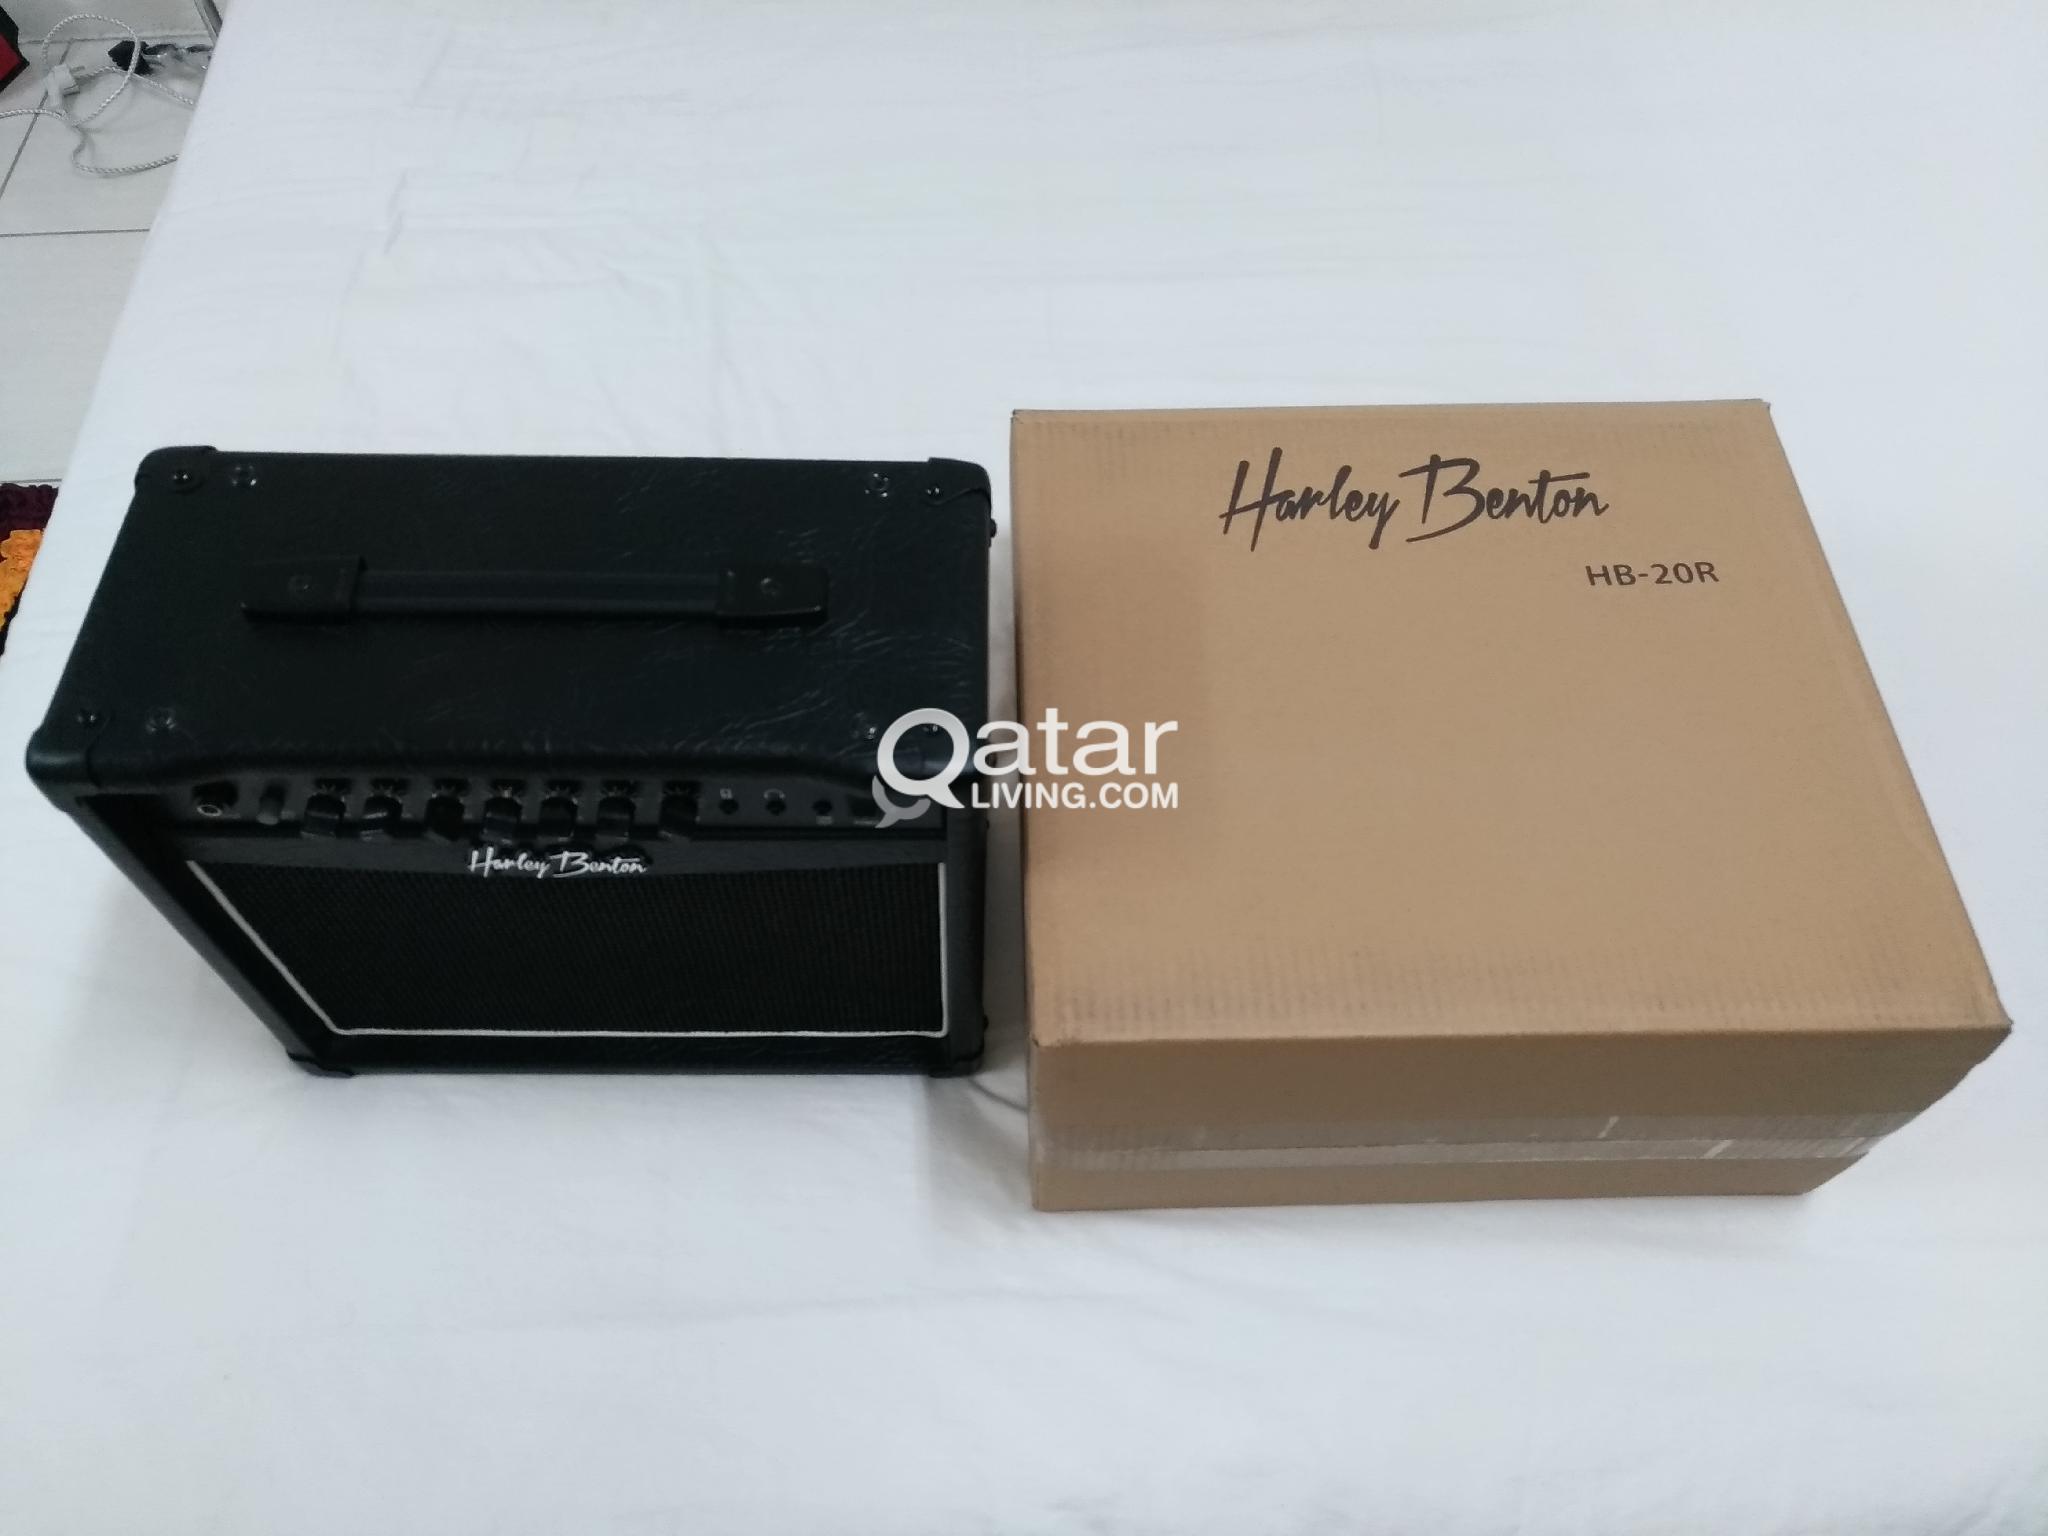 HARLEY BENTON GUITAR AMP | Qatar Living